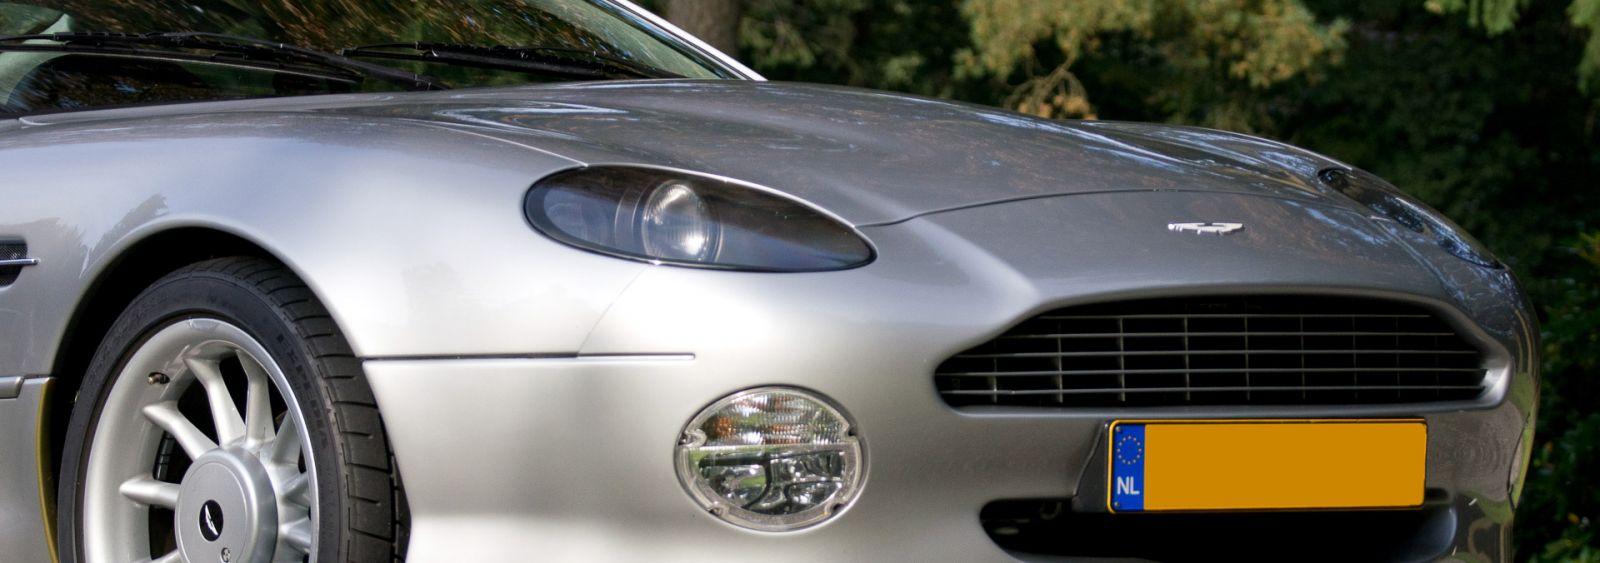 Aston Martin Db7 1995 Classicargarage De